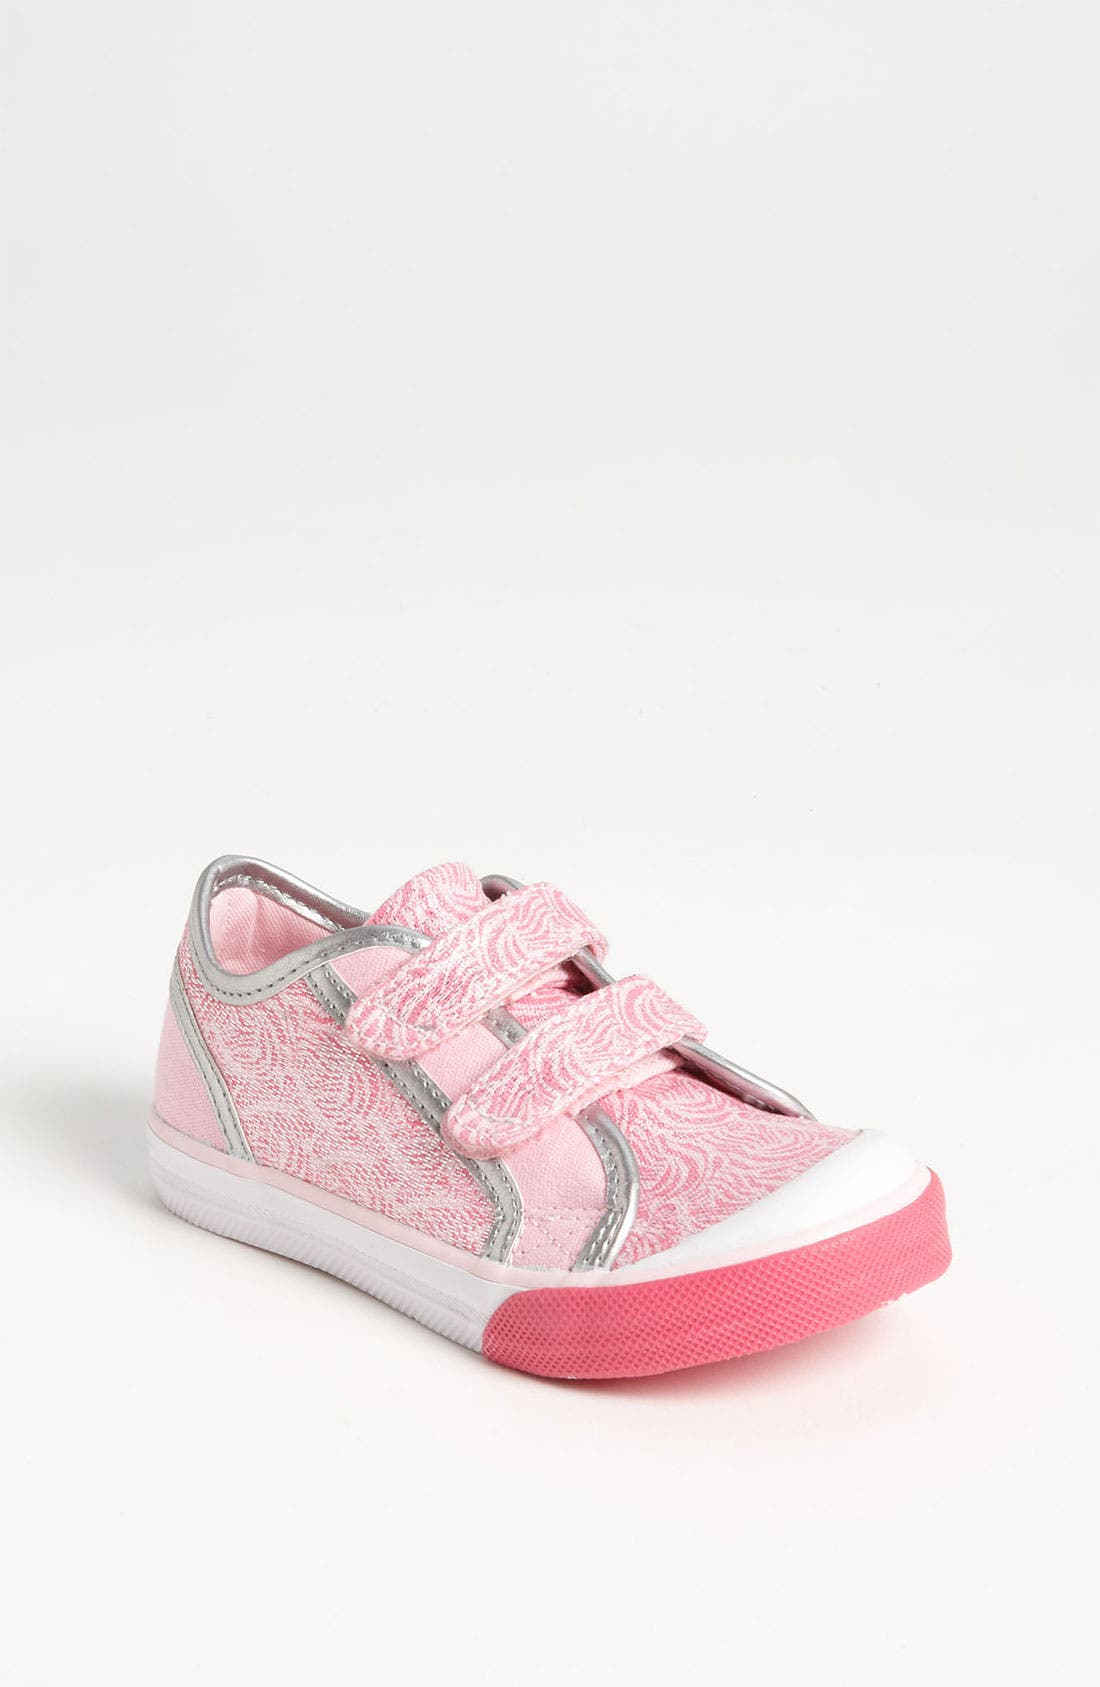 Alternate Image 1 Selected - Keds® 'Glamerly' Sneaker (Walker & Toddler)